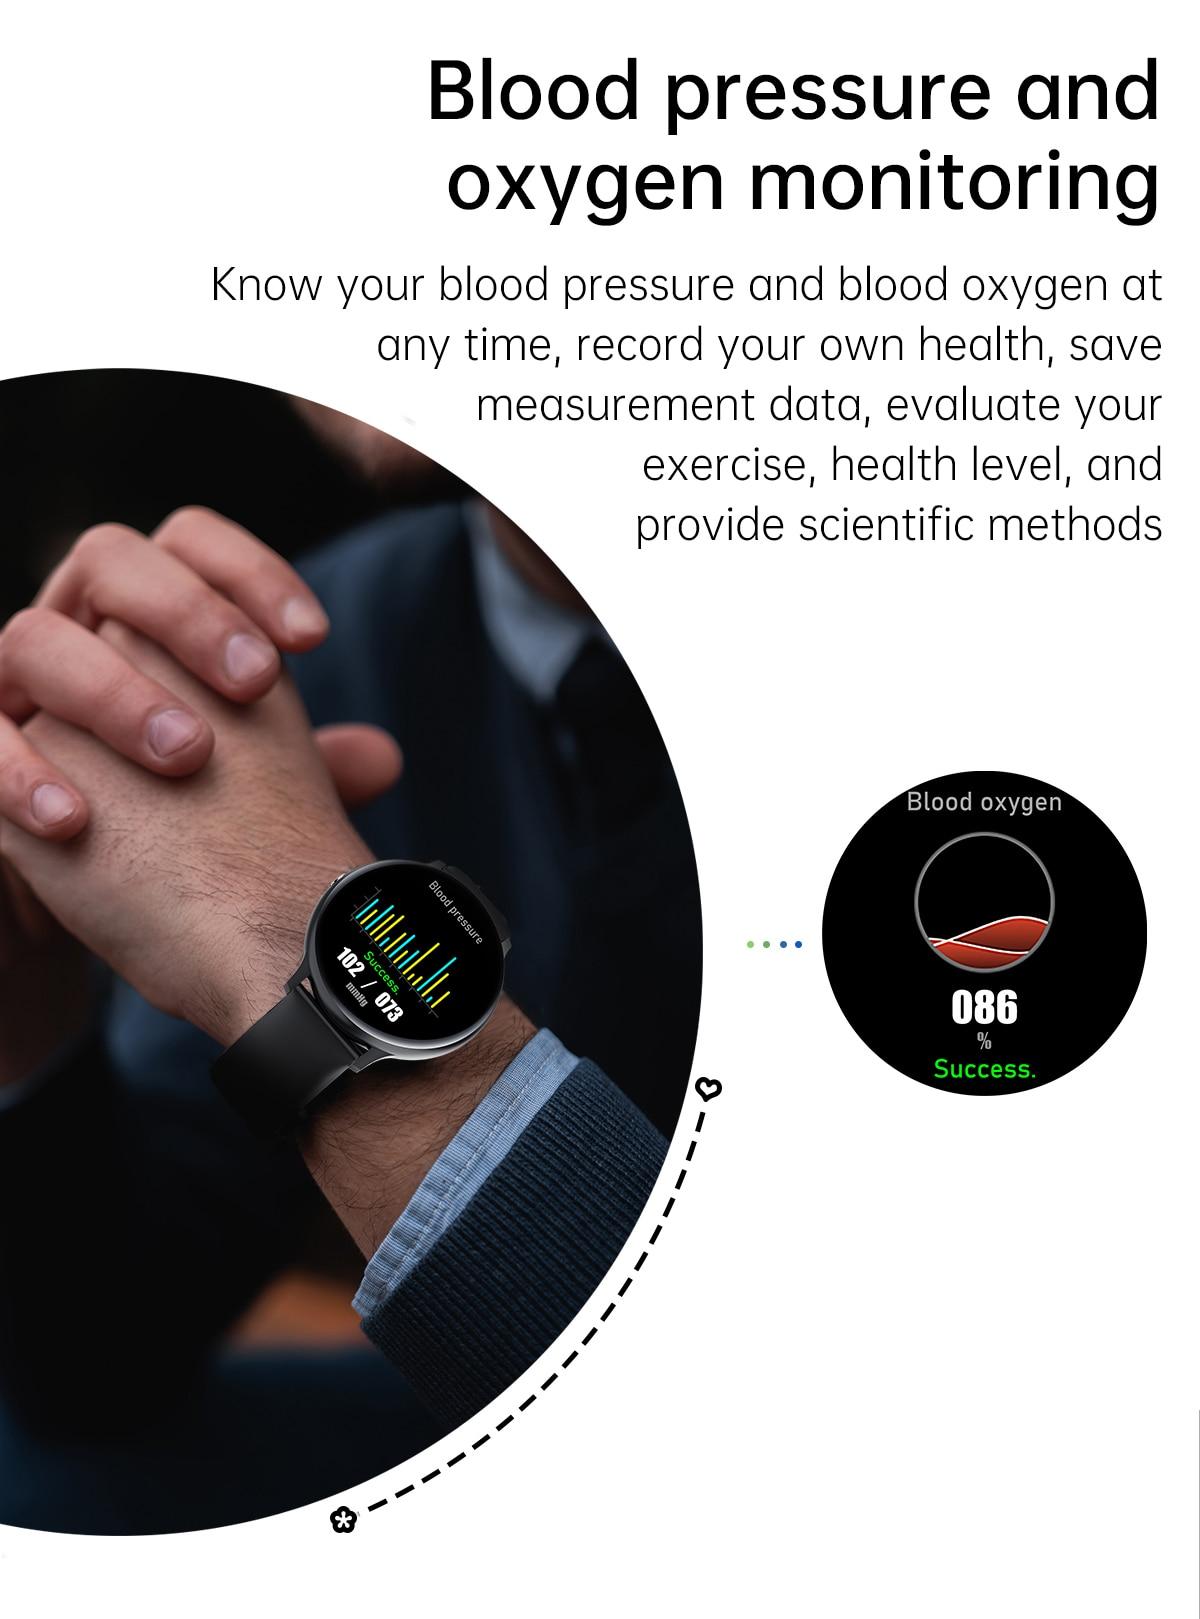 He1cee95f2bb04213a92534b4227ff27fD LIGE 2021 Bluetooth Answer Call Smart Watch Men Full Touch Dial Call Fitness Tracker IP67 Waterproof 4G ROM Smartwatch for women